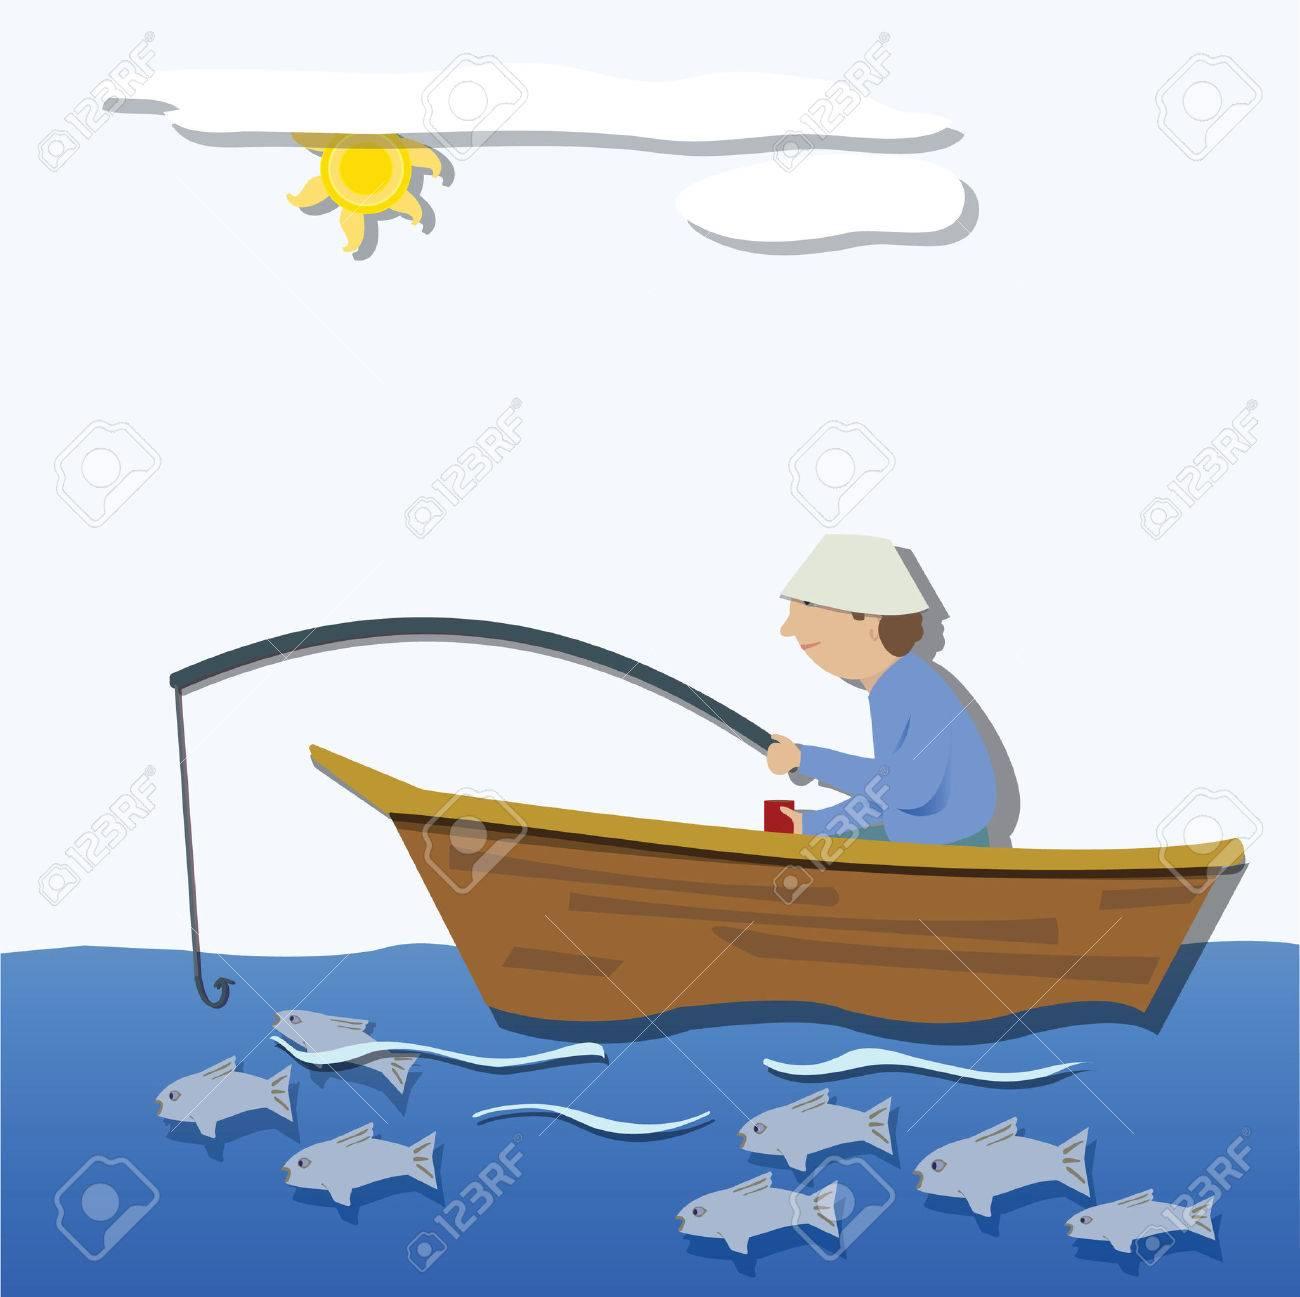 15 941 Fishing Boat Cliparts Stock Vector And Royalty Free Fishing